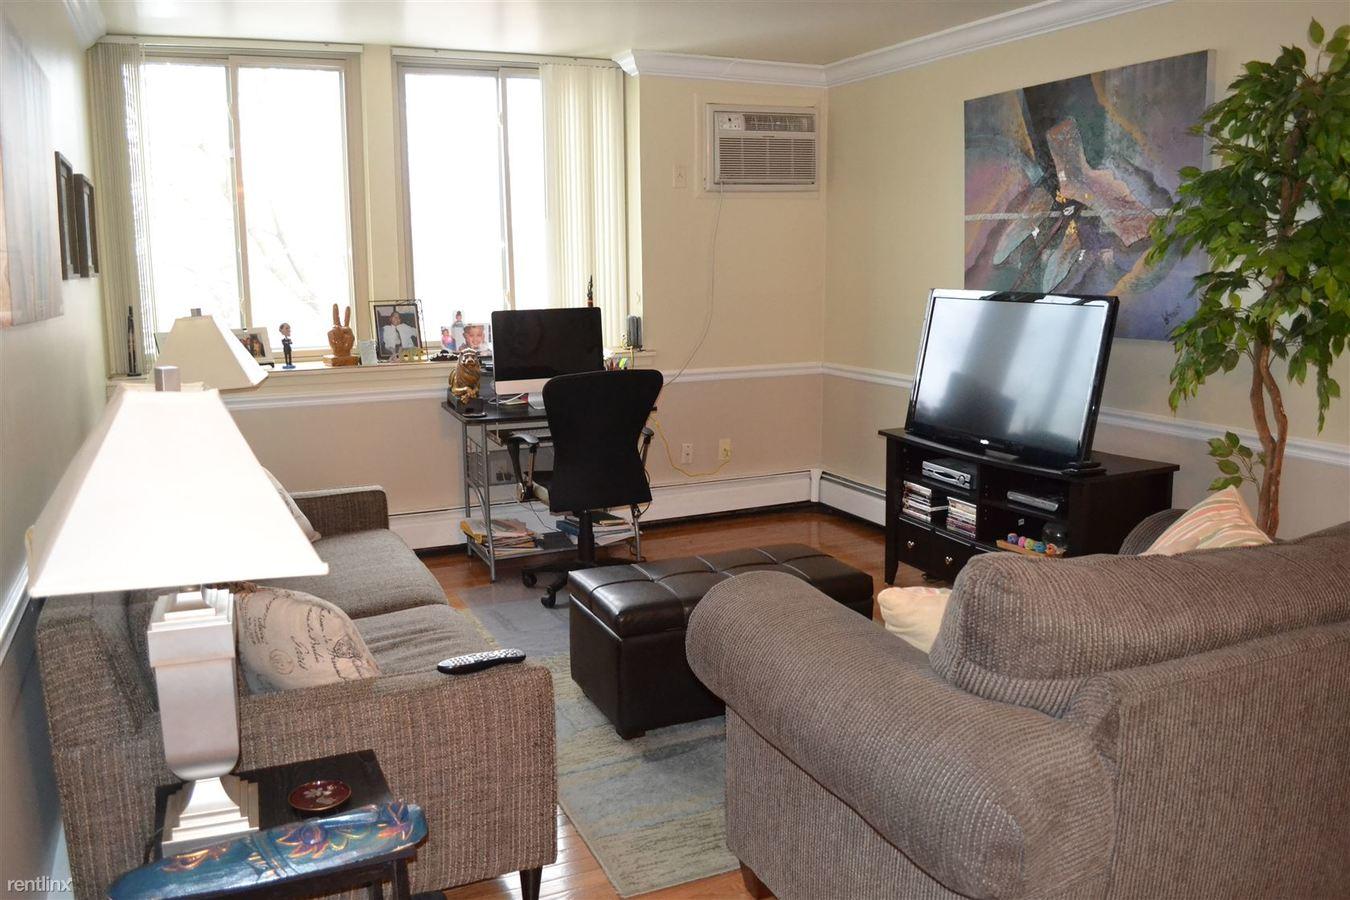 1 Bedroom 1 Bathroom Apartment for rent at 125 Perrin St in Ypsilanti, MI